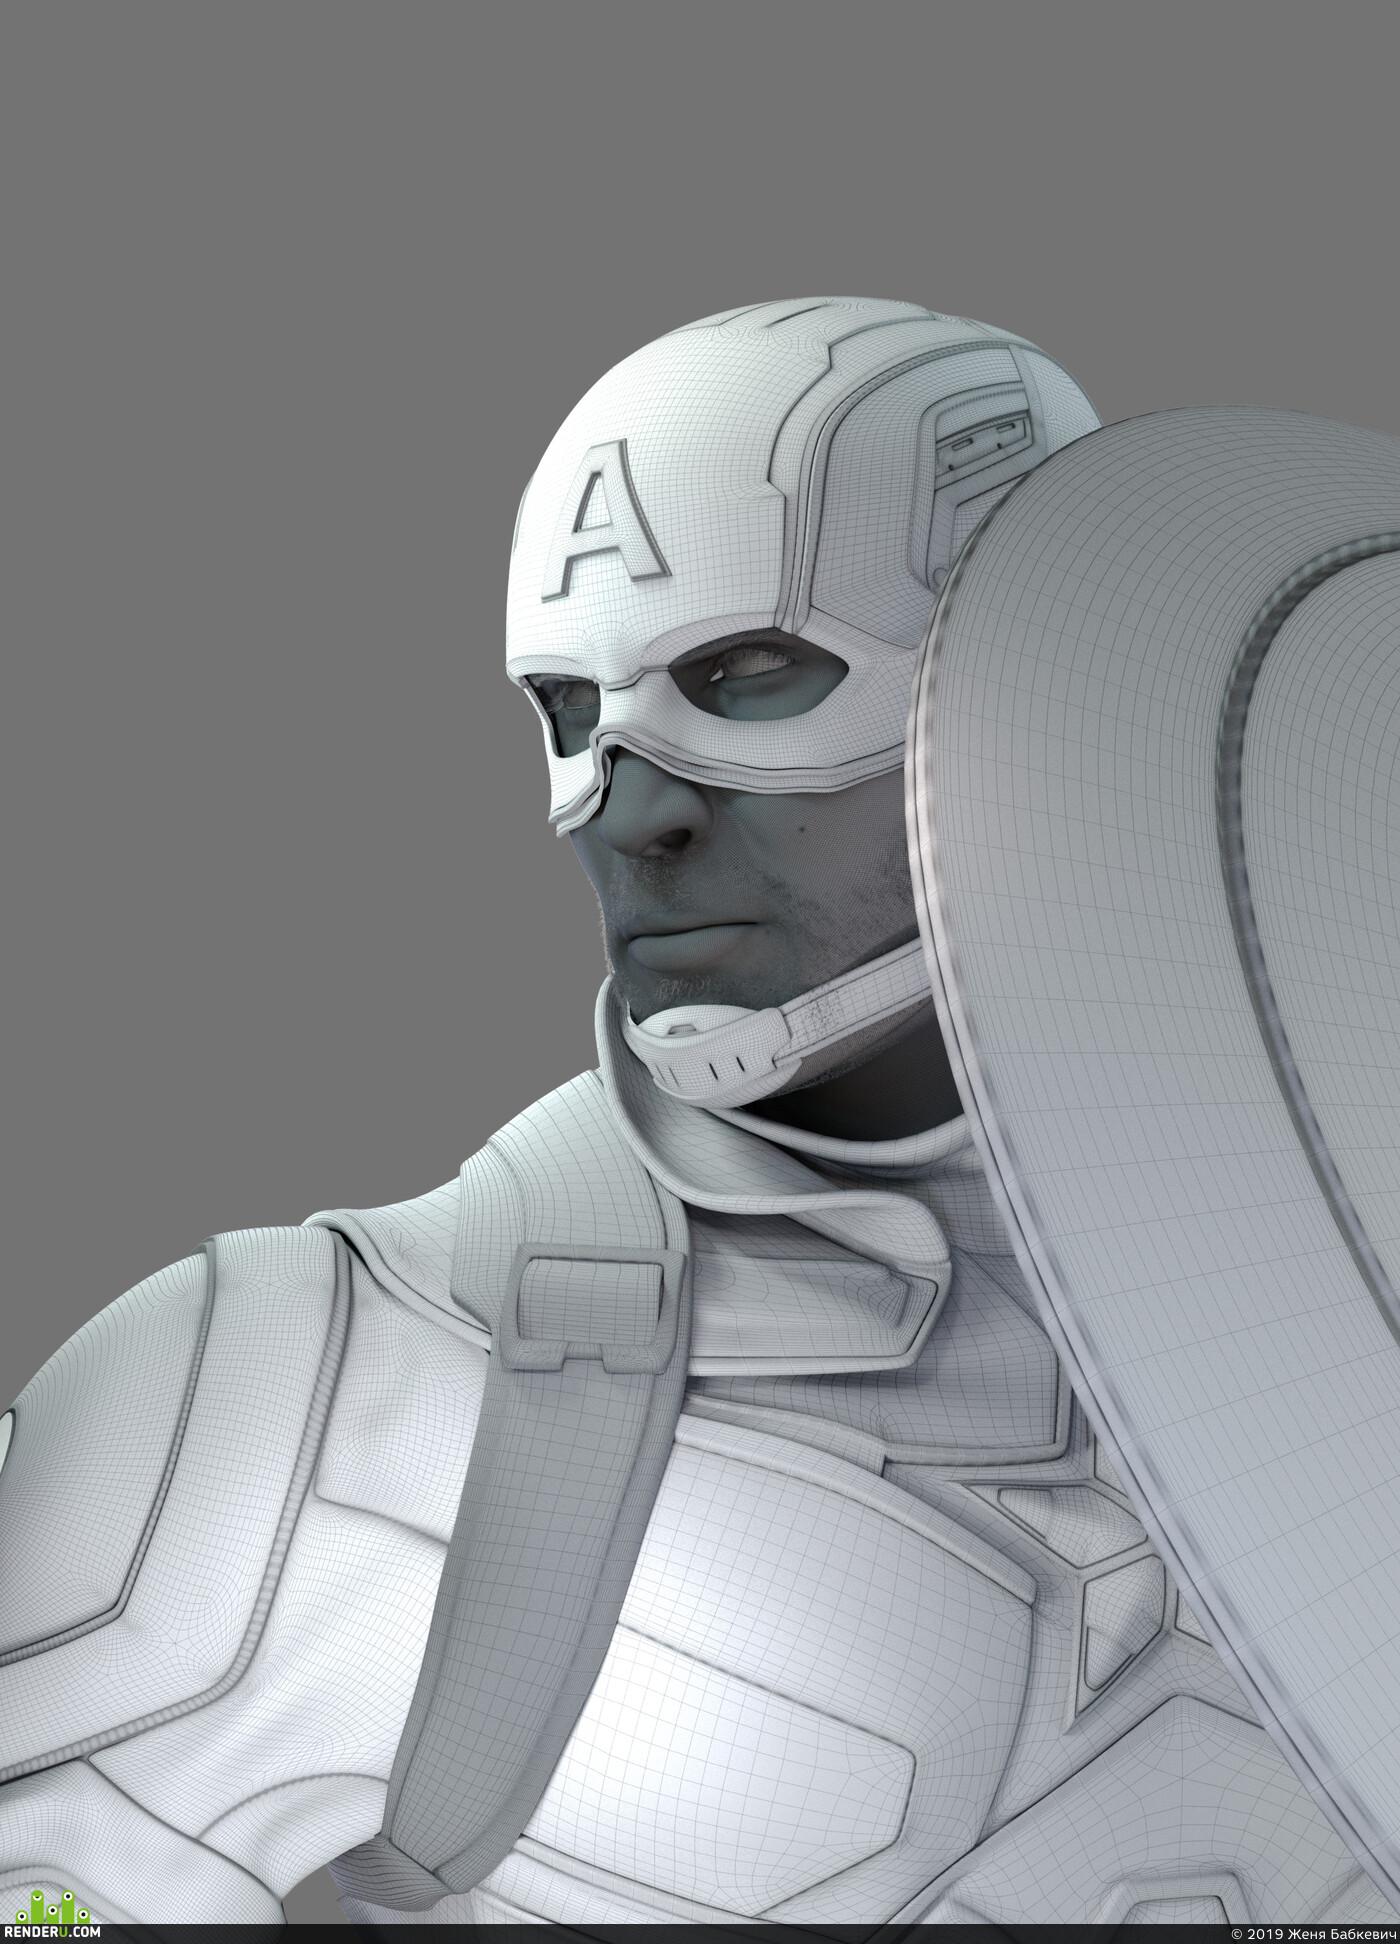 CaptainAmerica, CivilWar, The avengers, The first avenger, soildier, weapon, airport, M98B